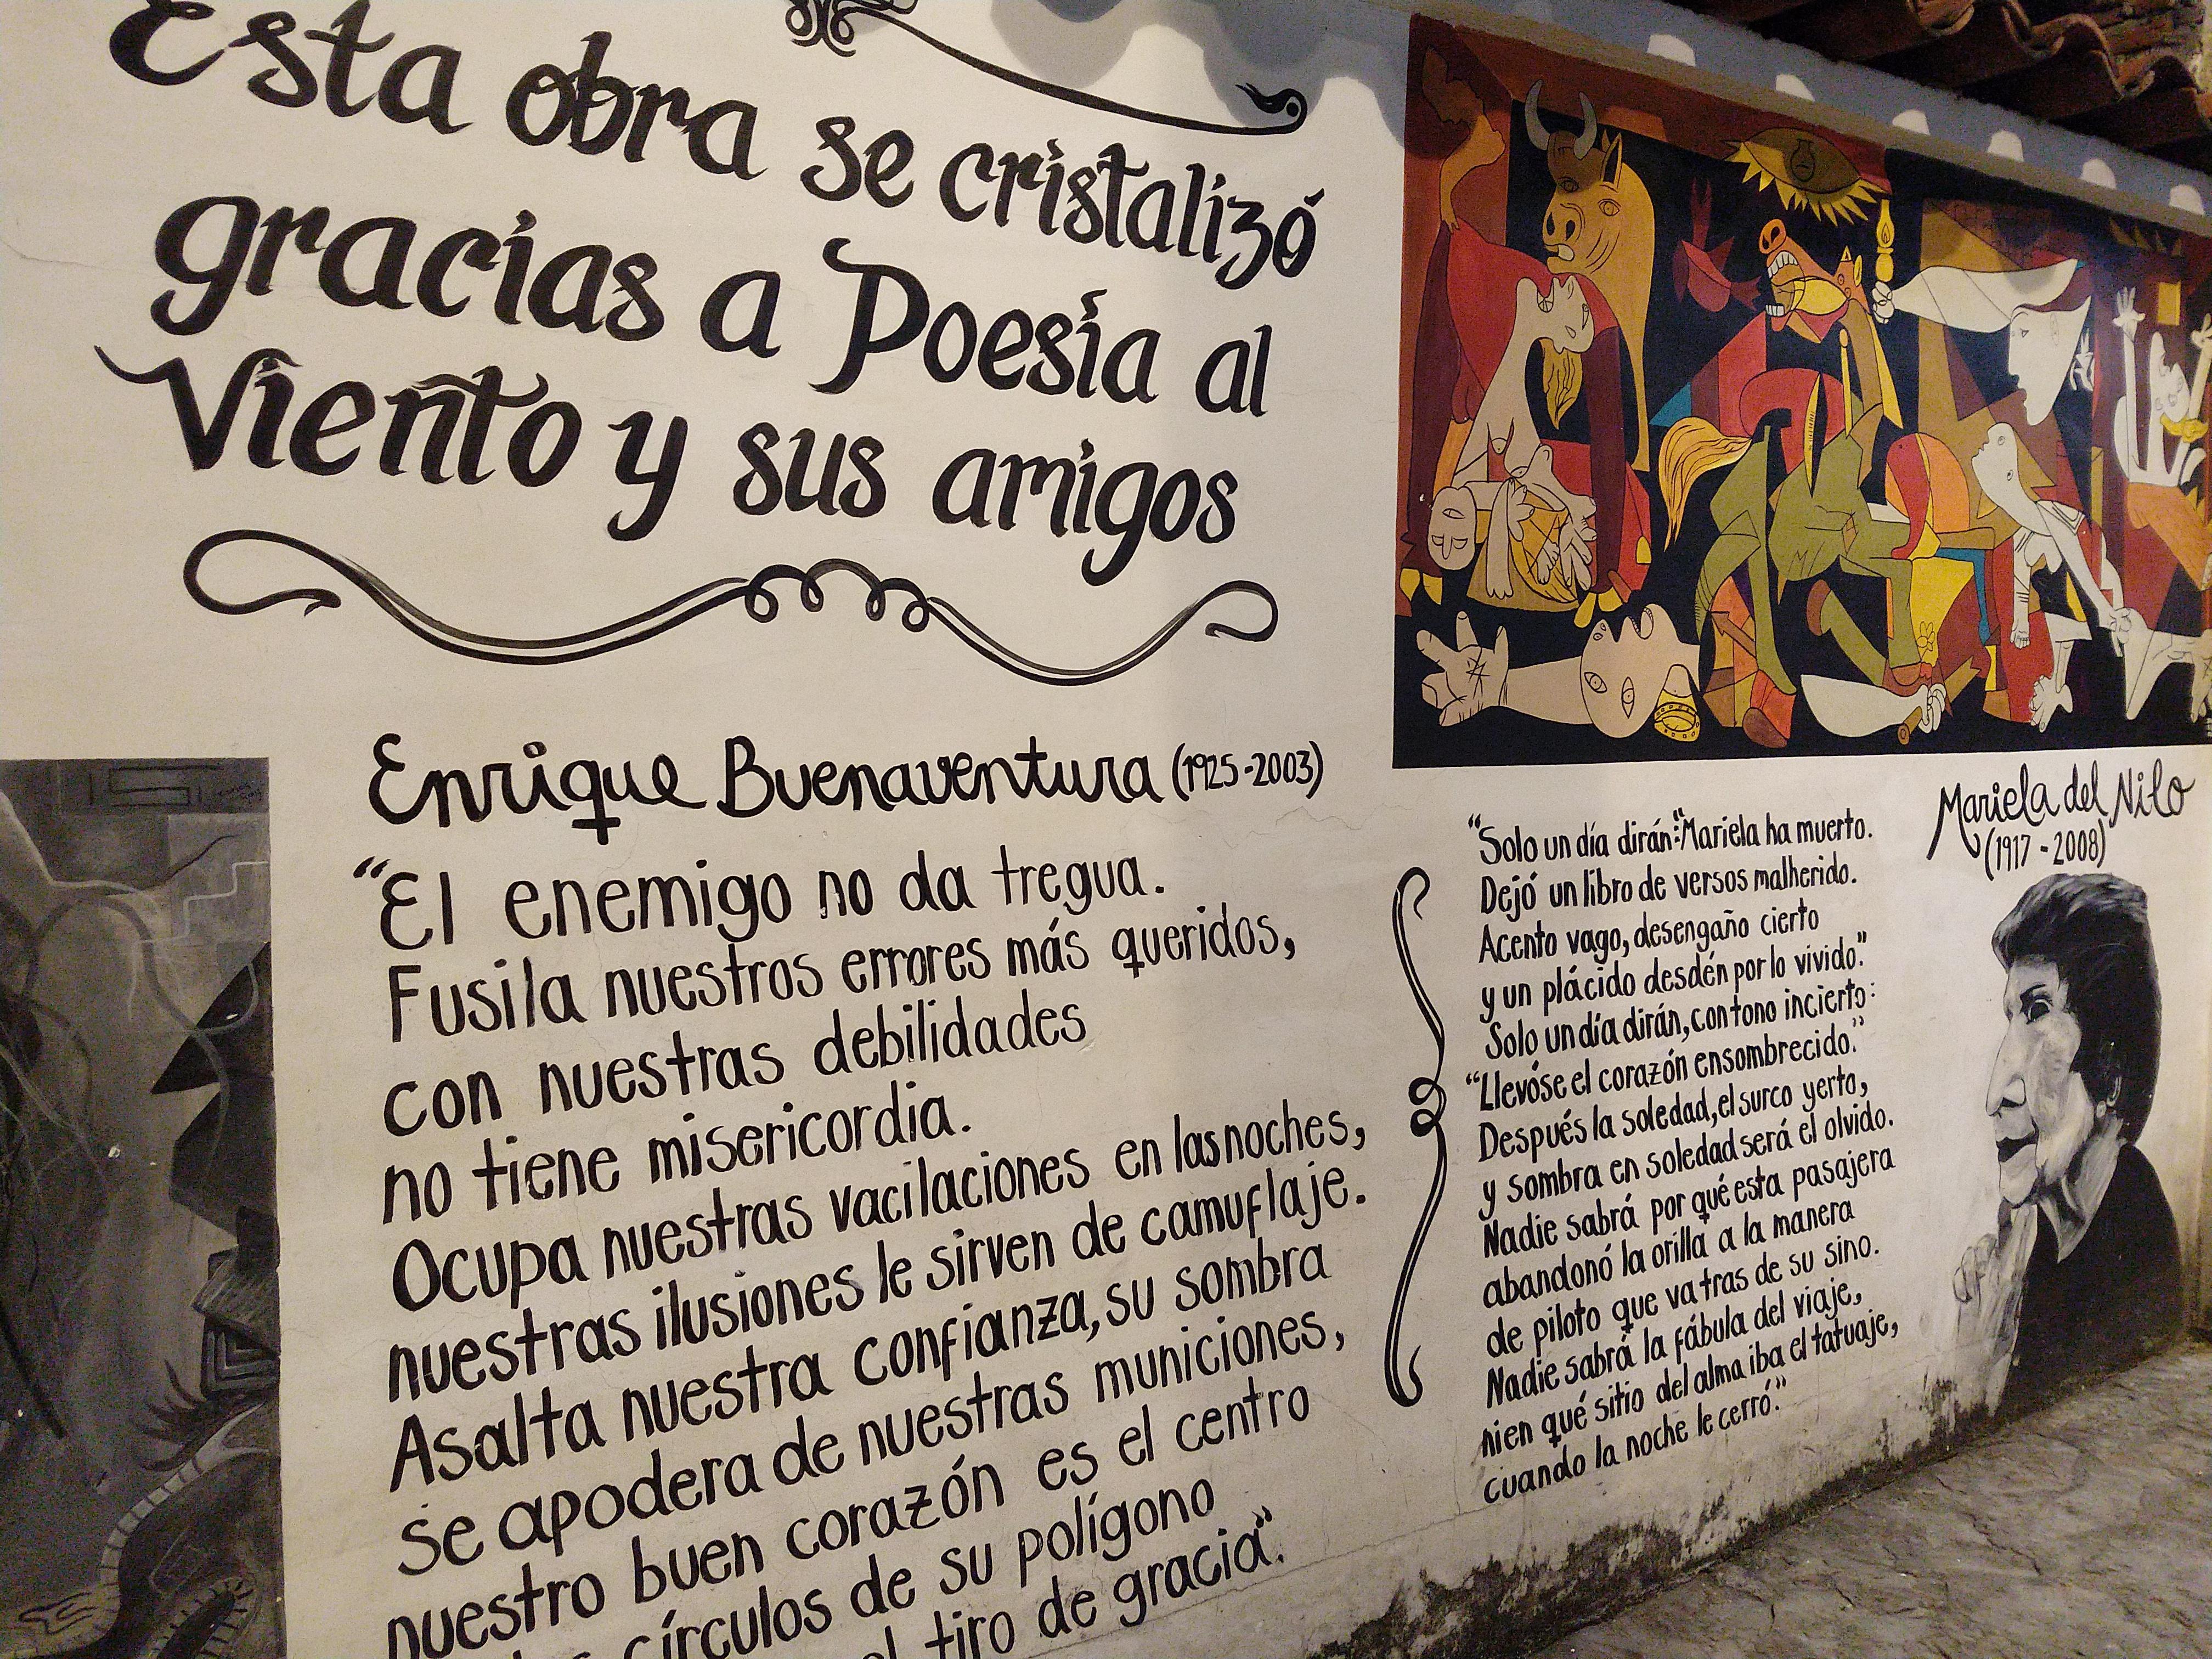 b82ab3e397 File Loma de la Cruz en Navidad 12.jpg - Wikimedia Commons